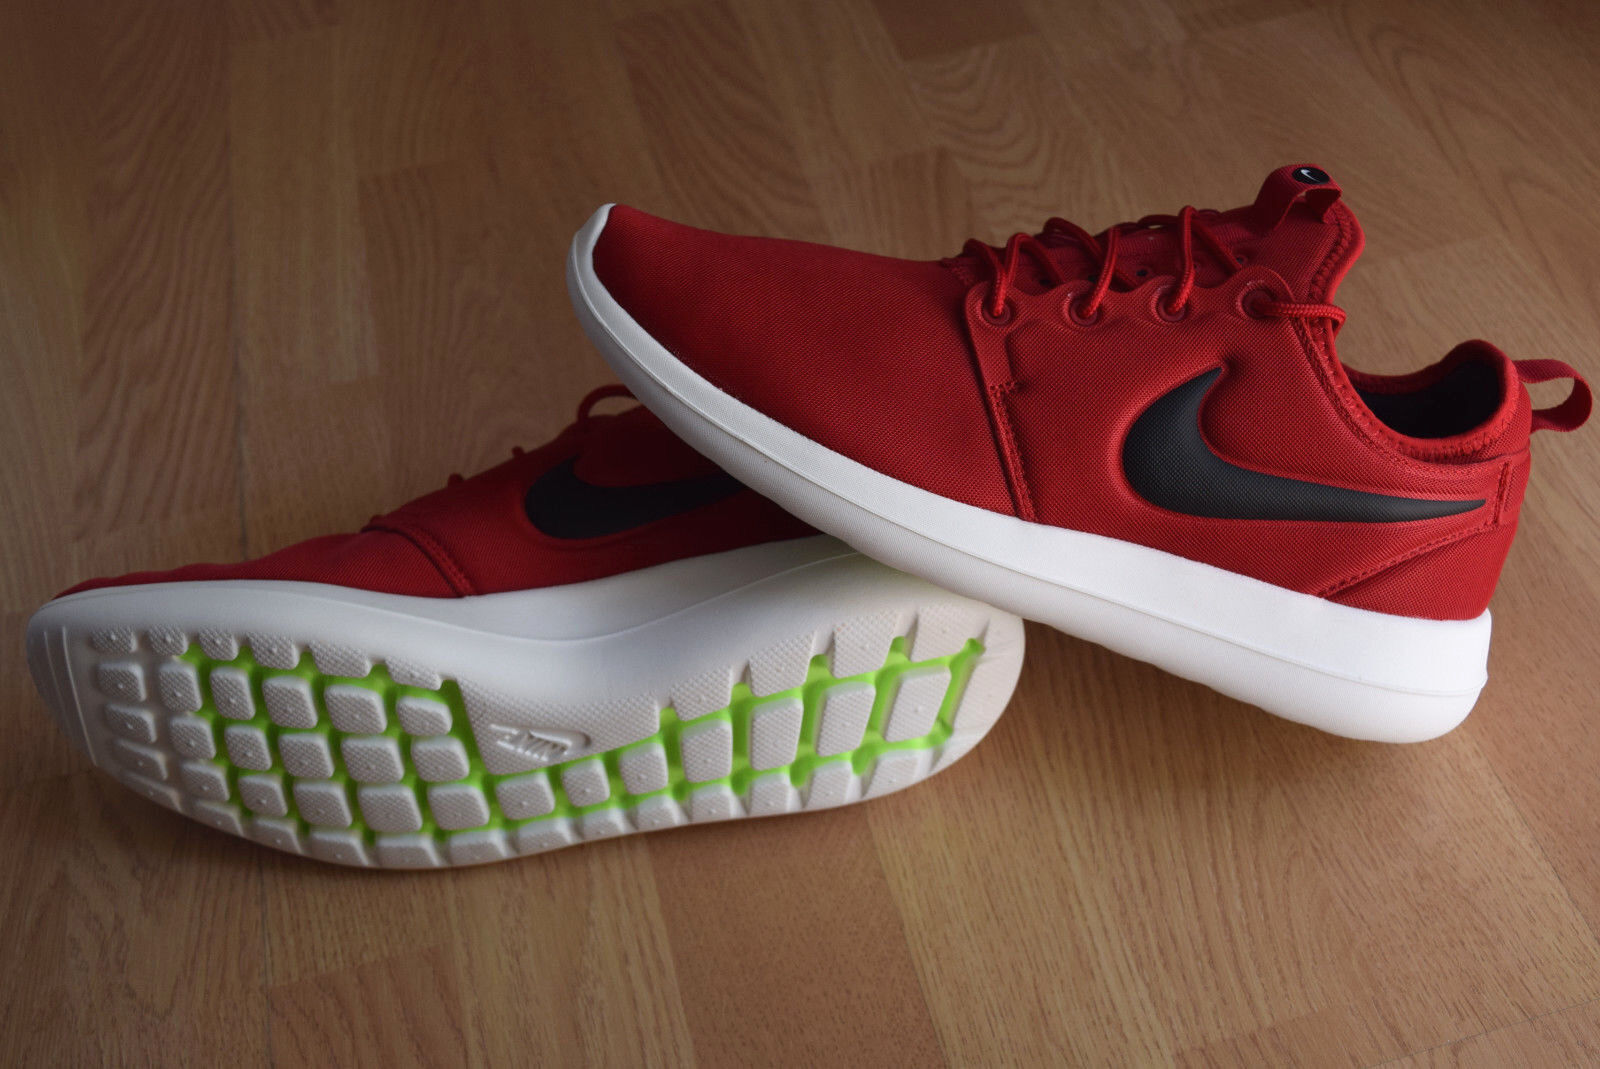 Nike Roshe Two 41 47 42 44 45 46 47 41 one fReE rUn aIr mAx 1 tAvas presto 844656 600 fe2a73